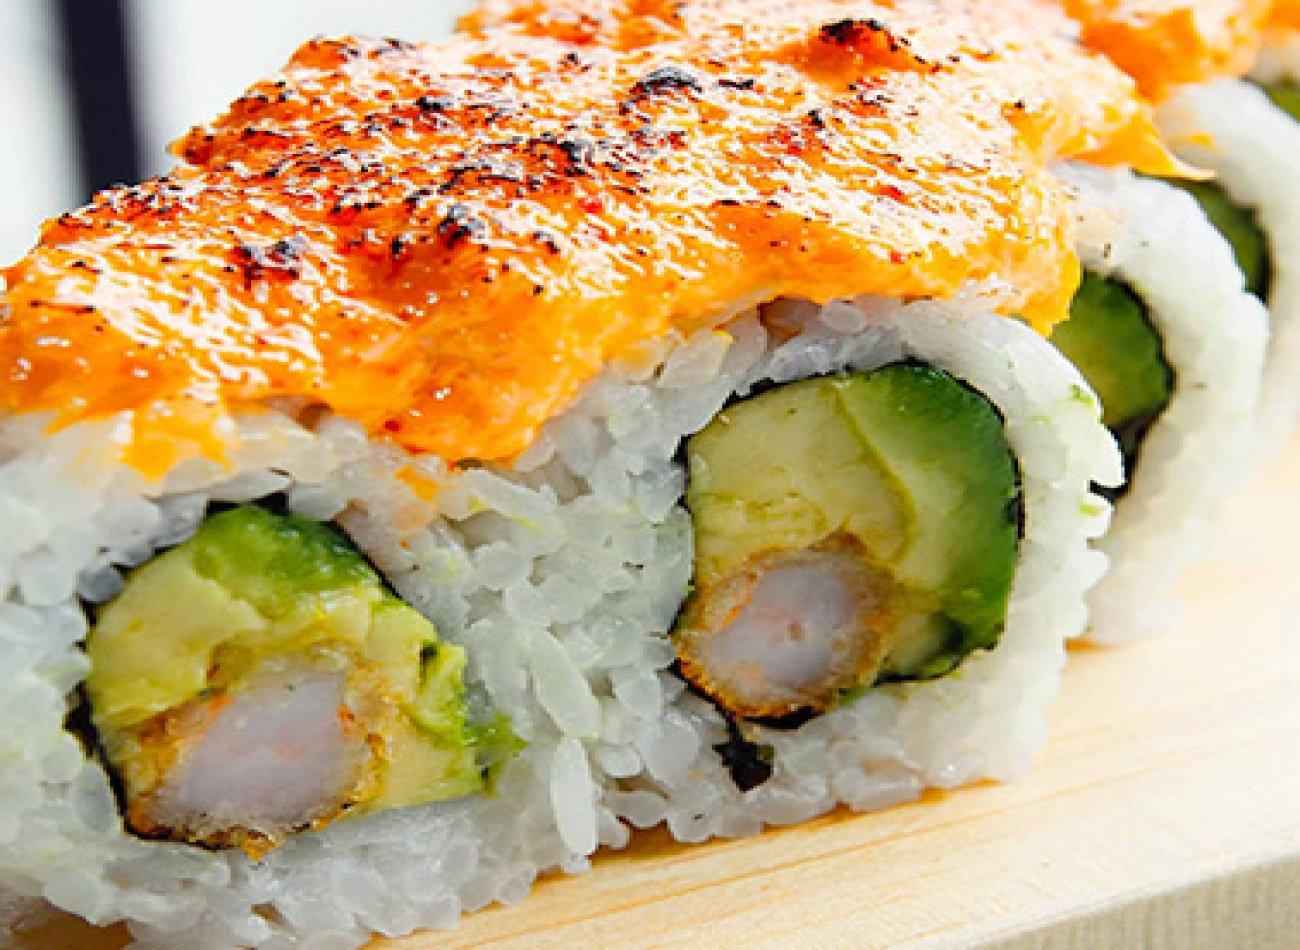 MR SUSHI - SAN ISIDRO Restaurante - Reserva en restaurantes de Comida NIKKEI / JAPONESA - SAN ISIDRO - MESA 24/7 | LIMA - Perú